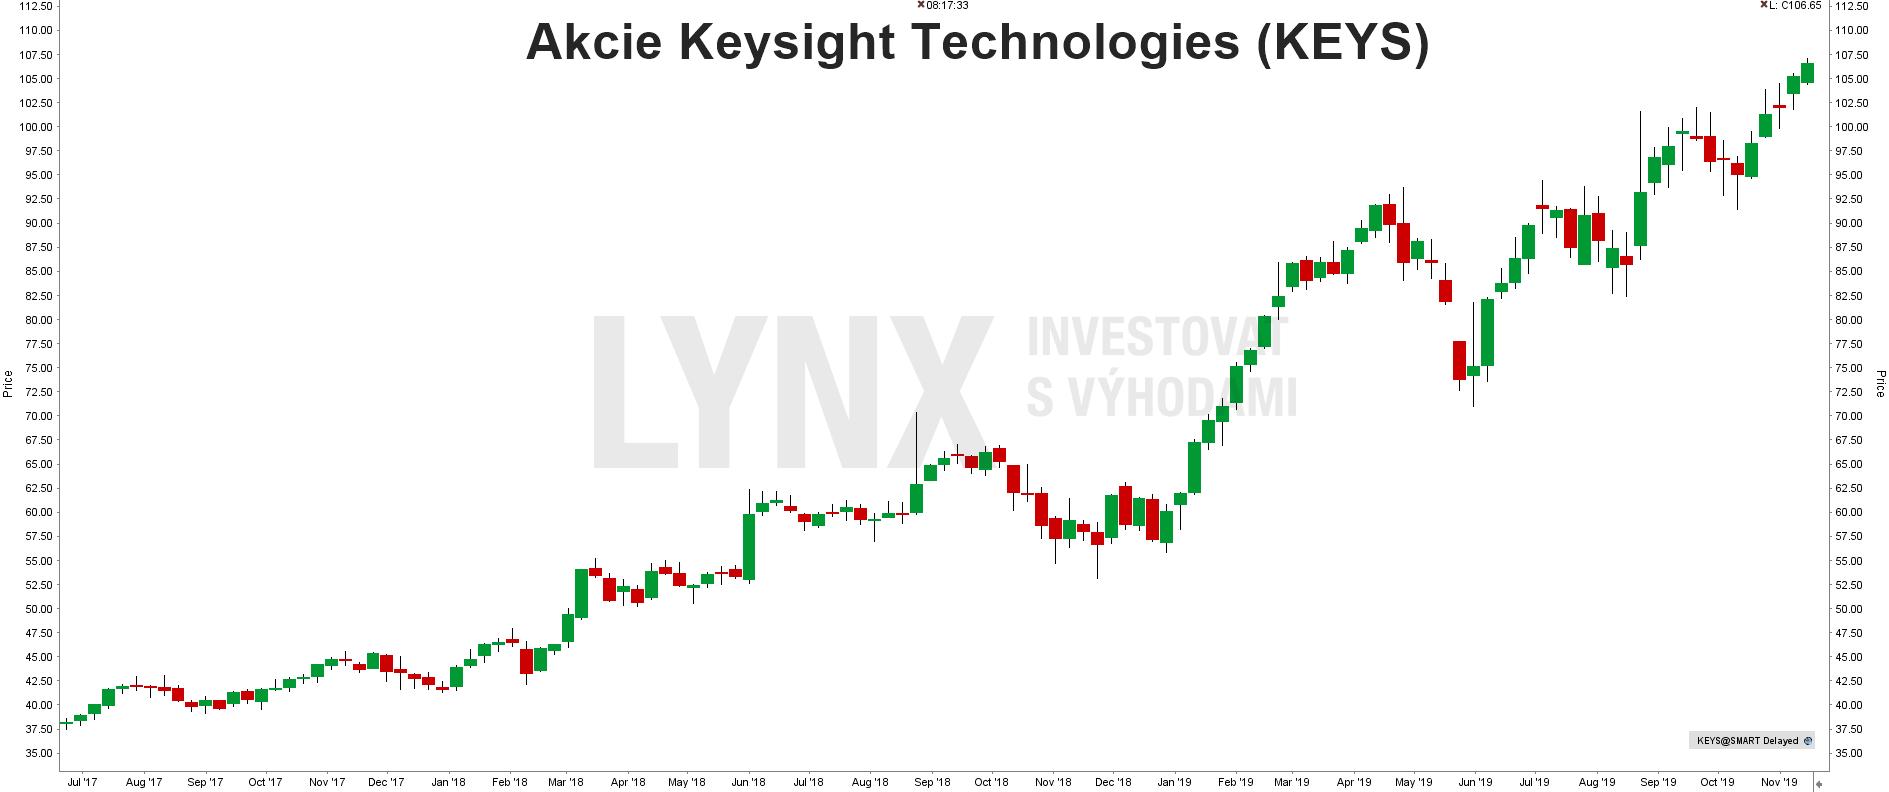 Akcie Keysight Technologies - graf